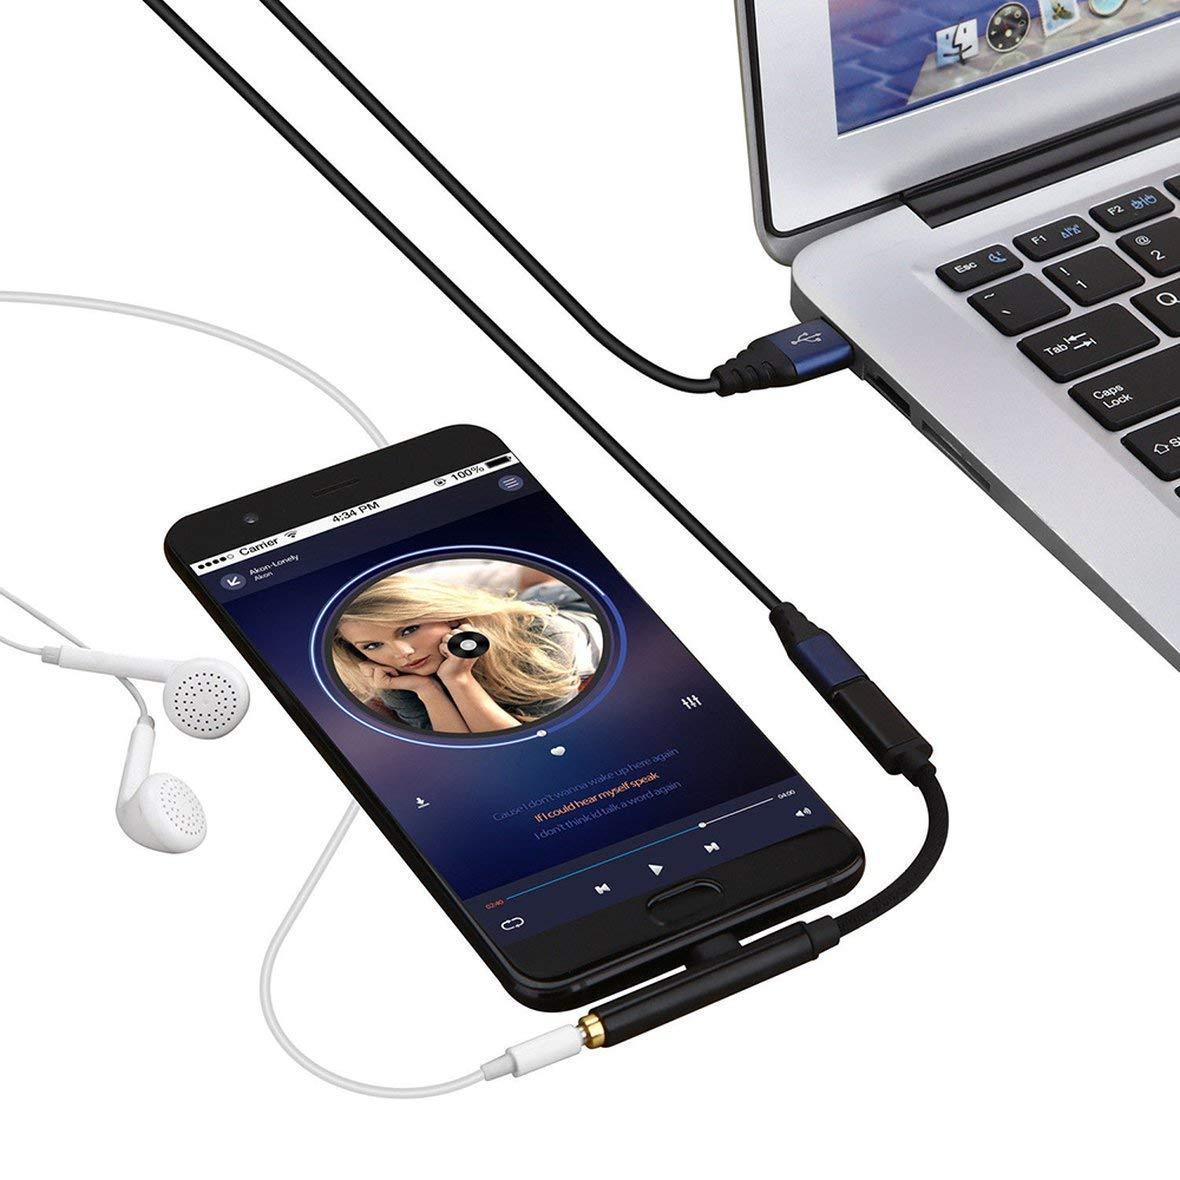 Heaviesk Robustes Typ-C auf USB-C 3,5-mm-Klinken-Audiokabel f/ür Huawei P20 Handy-Audio-Splitter 2-in-1-Typ-C-Kabel